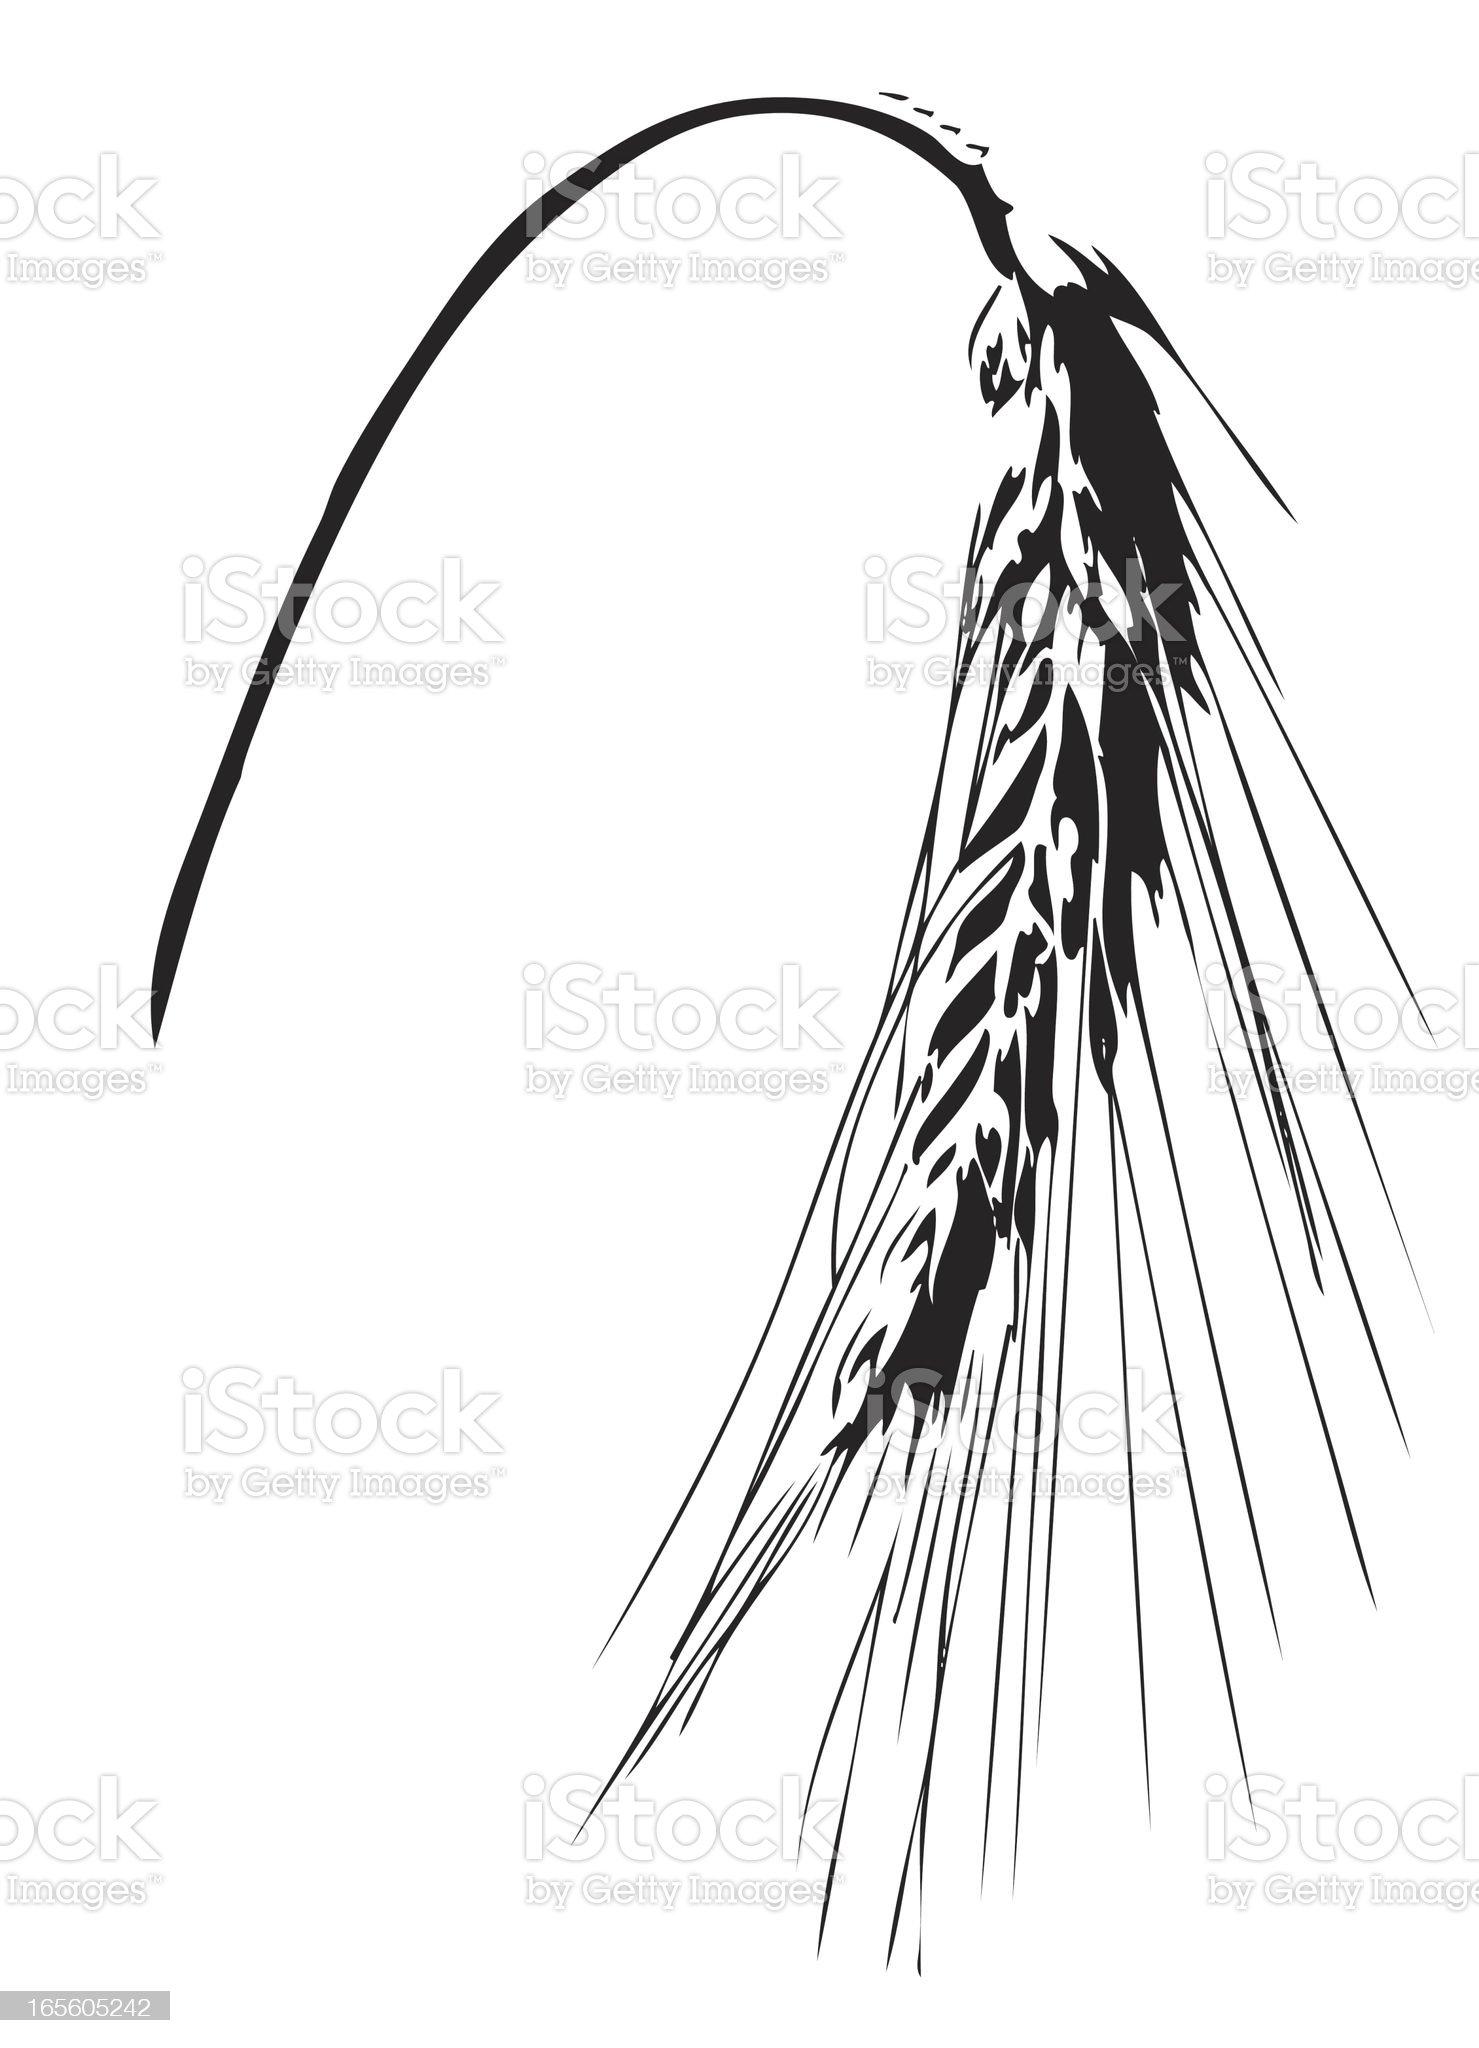 wheat ear illustration royalty-free stock vector art